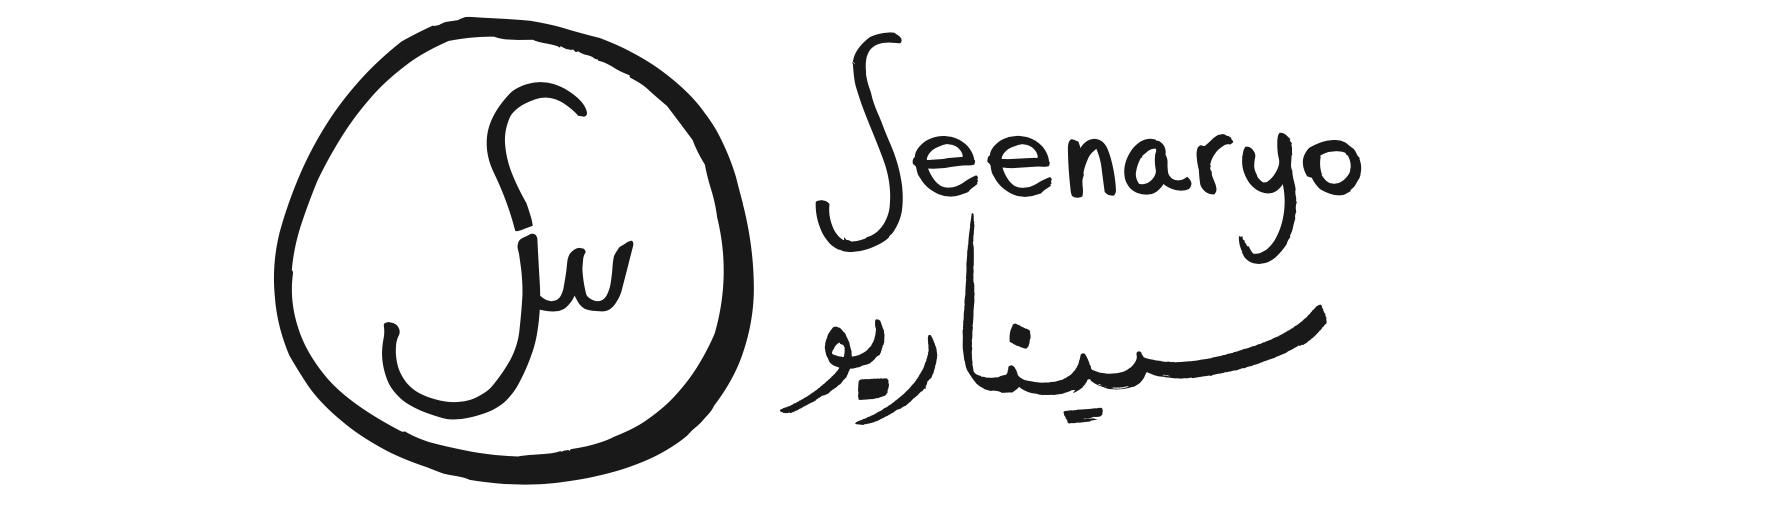 Seenaryo.png